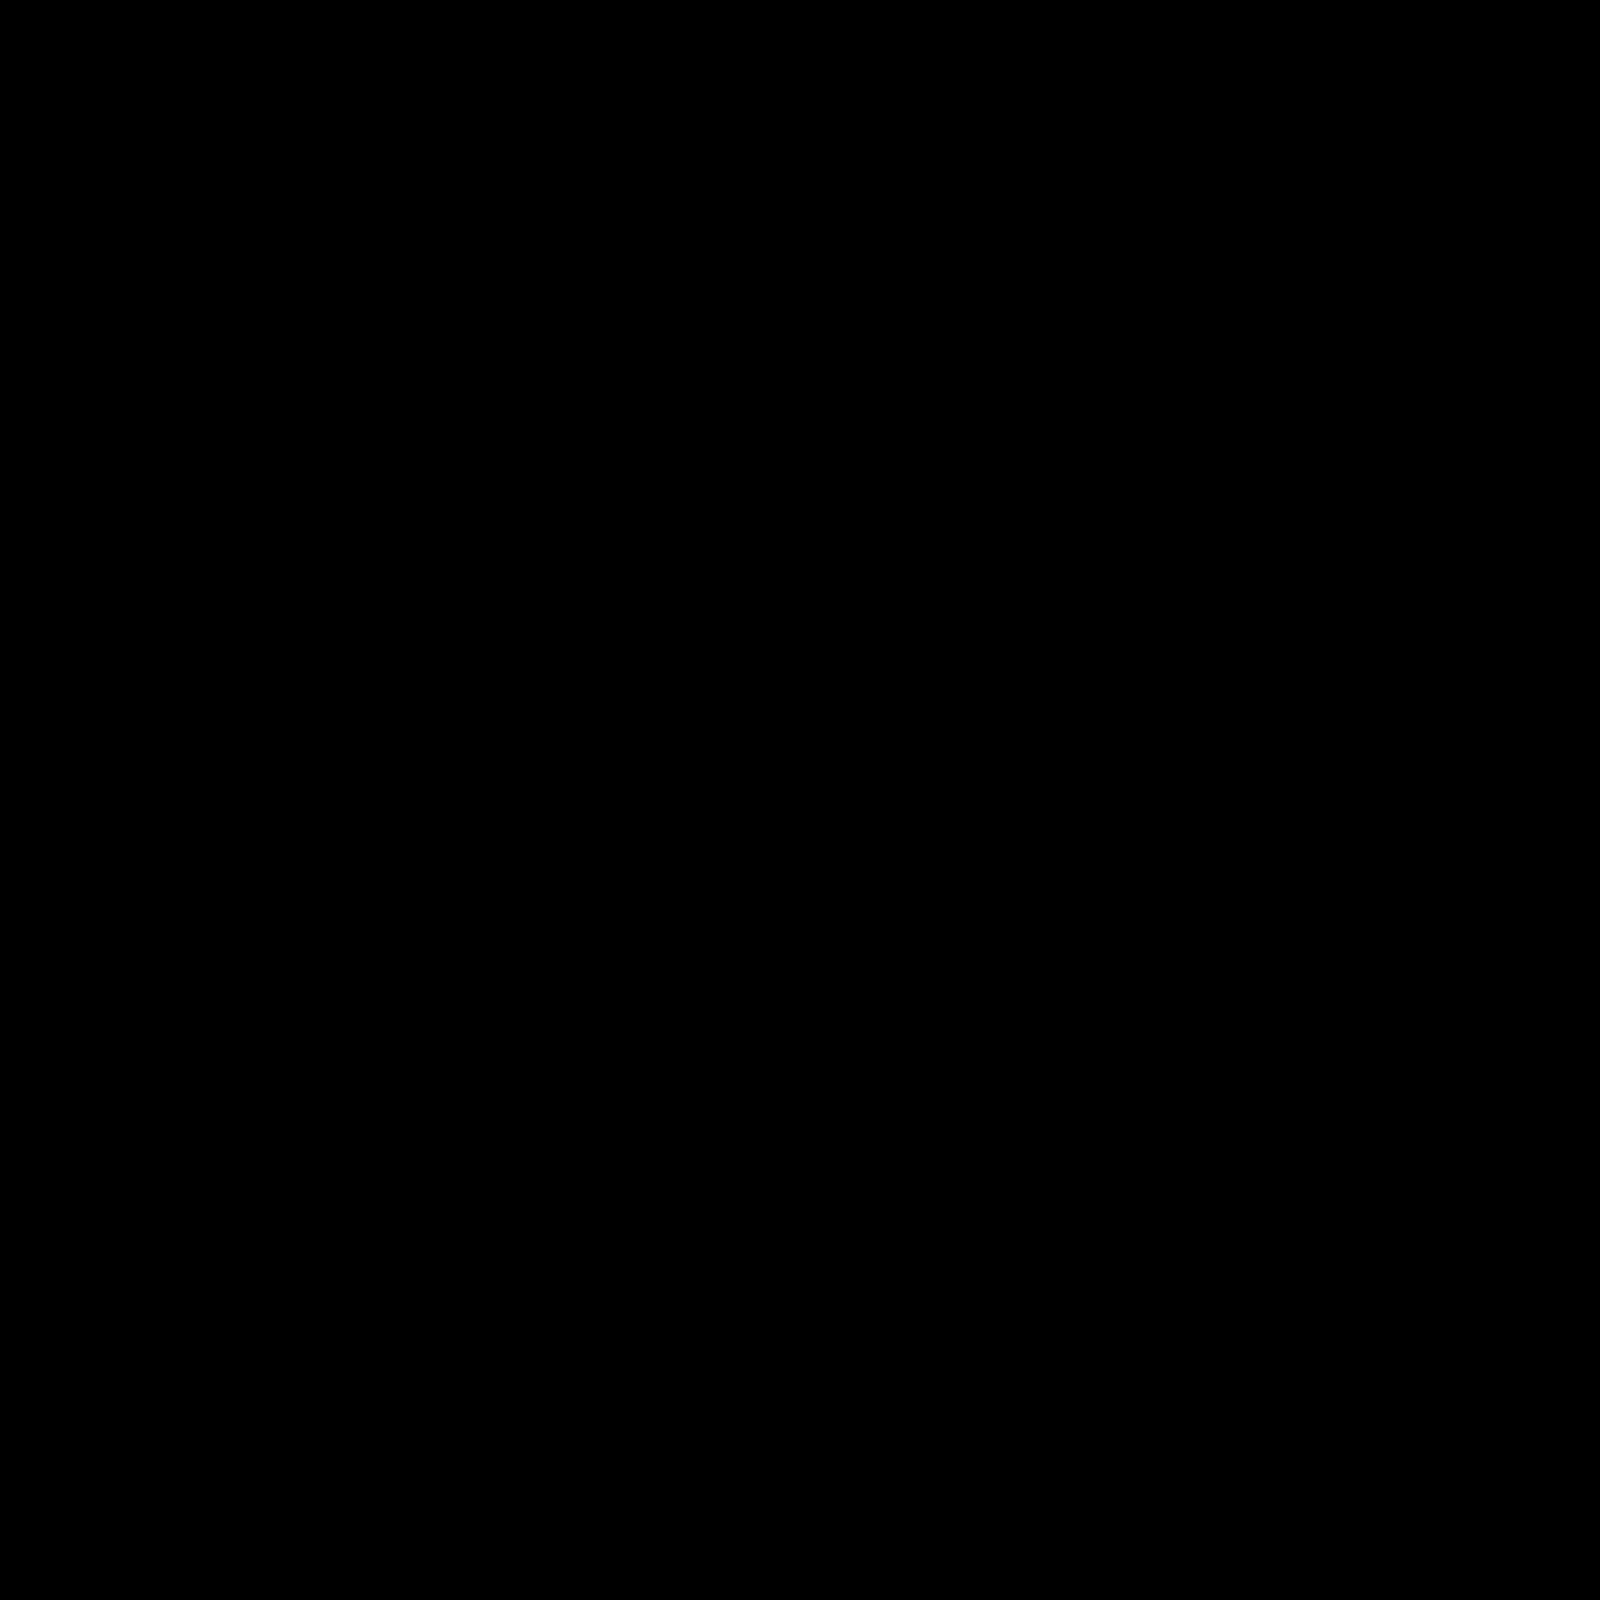 ACLC College icon